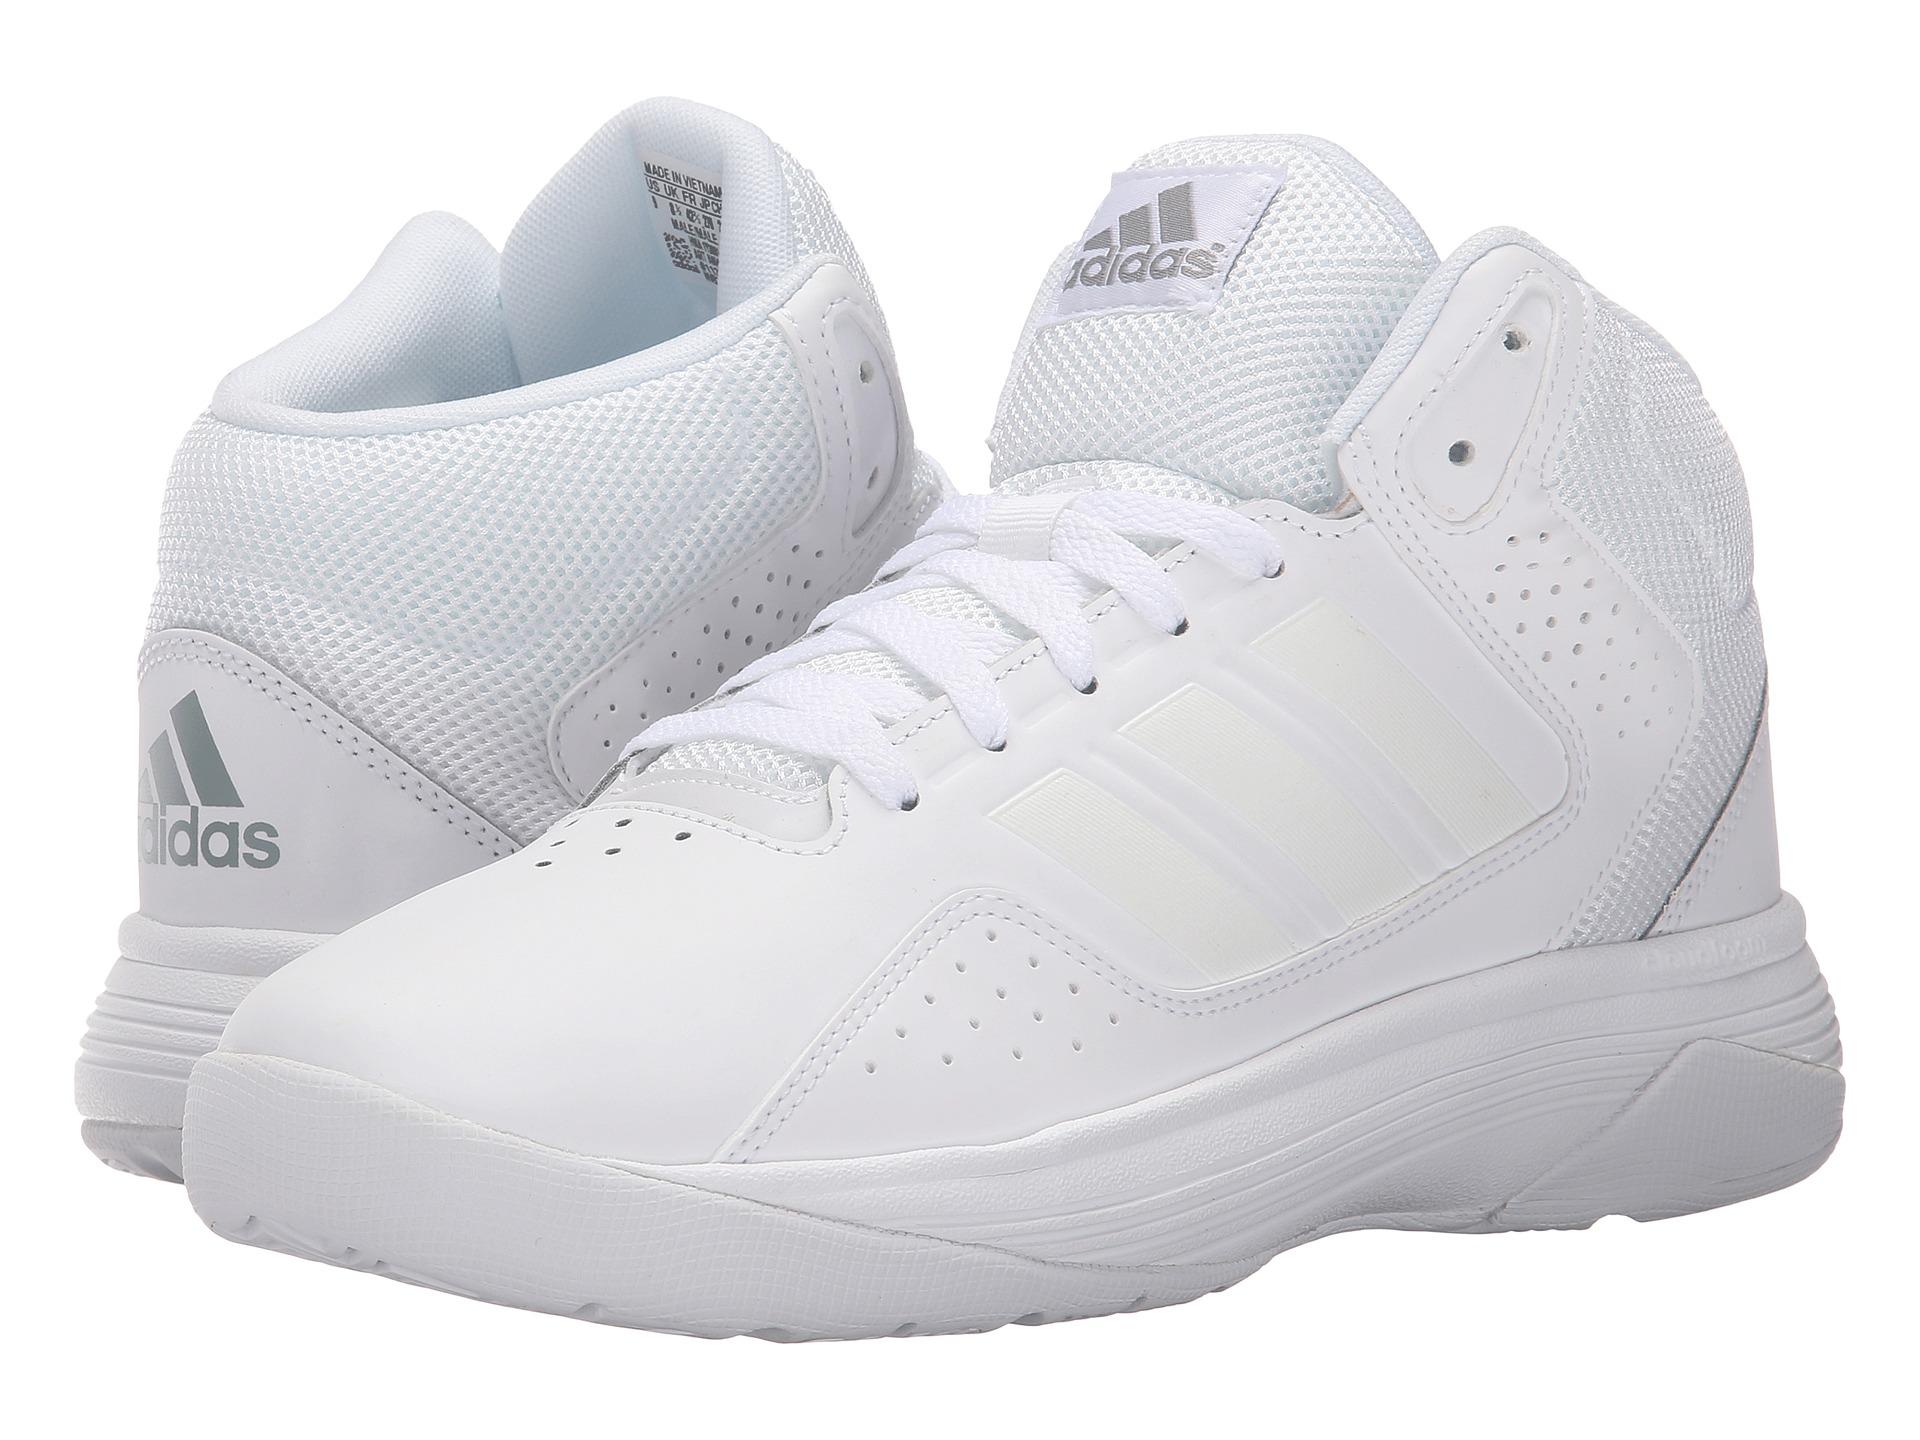 adidas Cloudfoam Ilation Mid White/White/Clear Onix ...